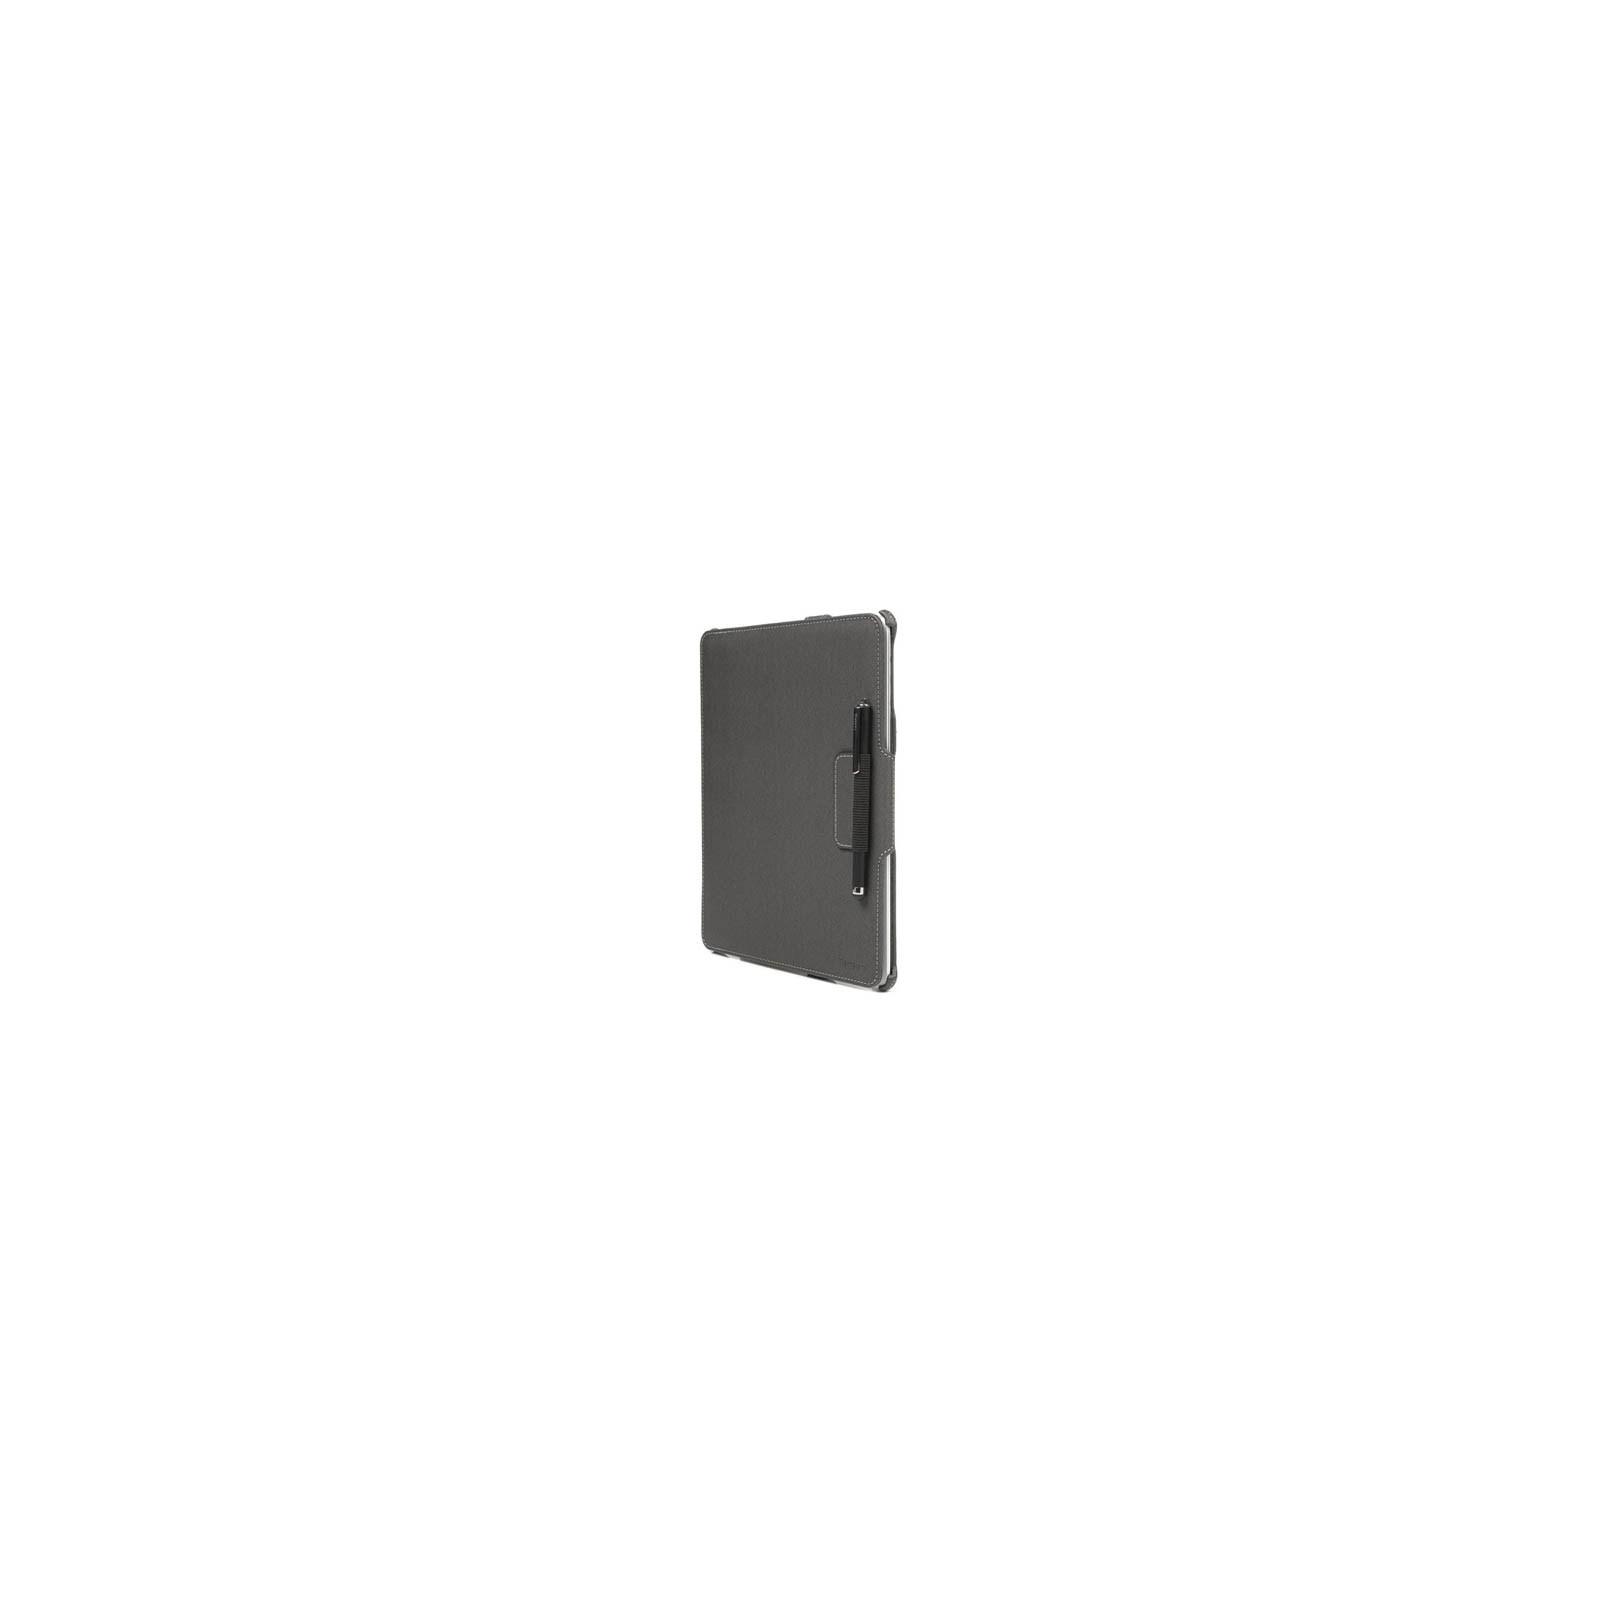 Чехол для планшета Targus iPad3 Vuscape Protective Cover with Stand (THZ15702EU-50)